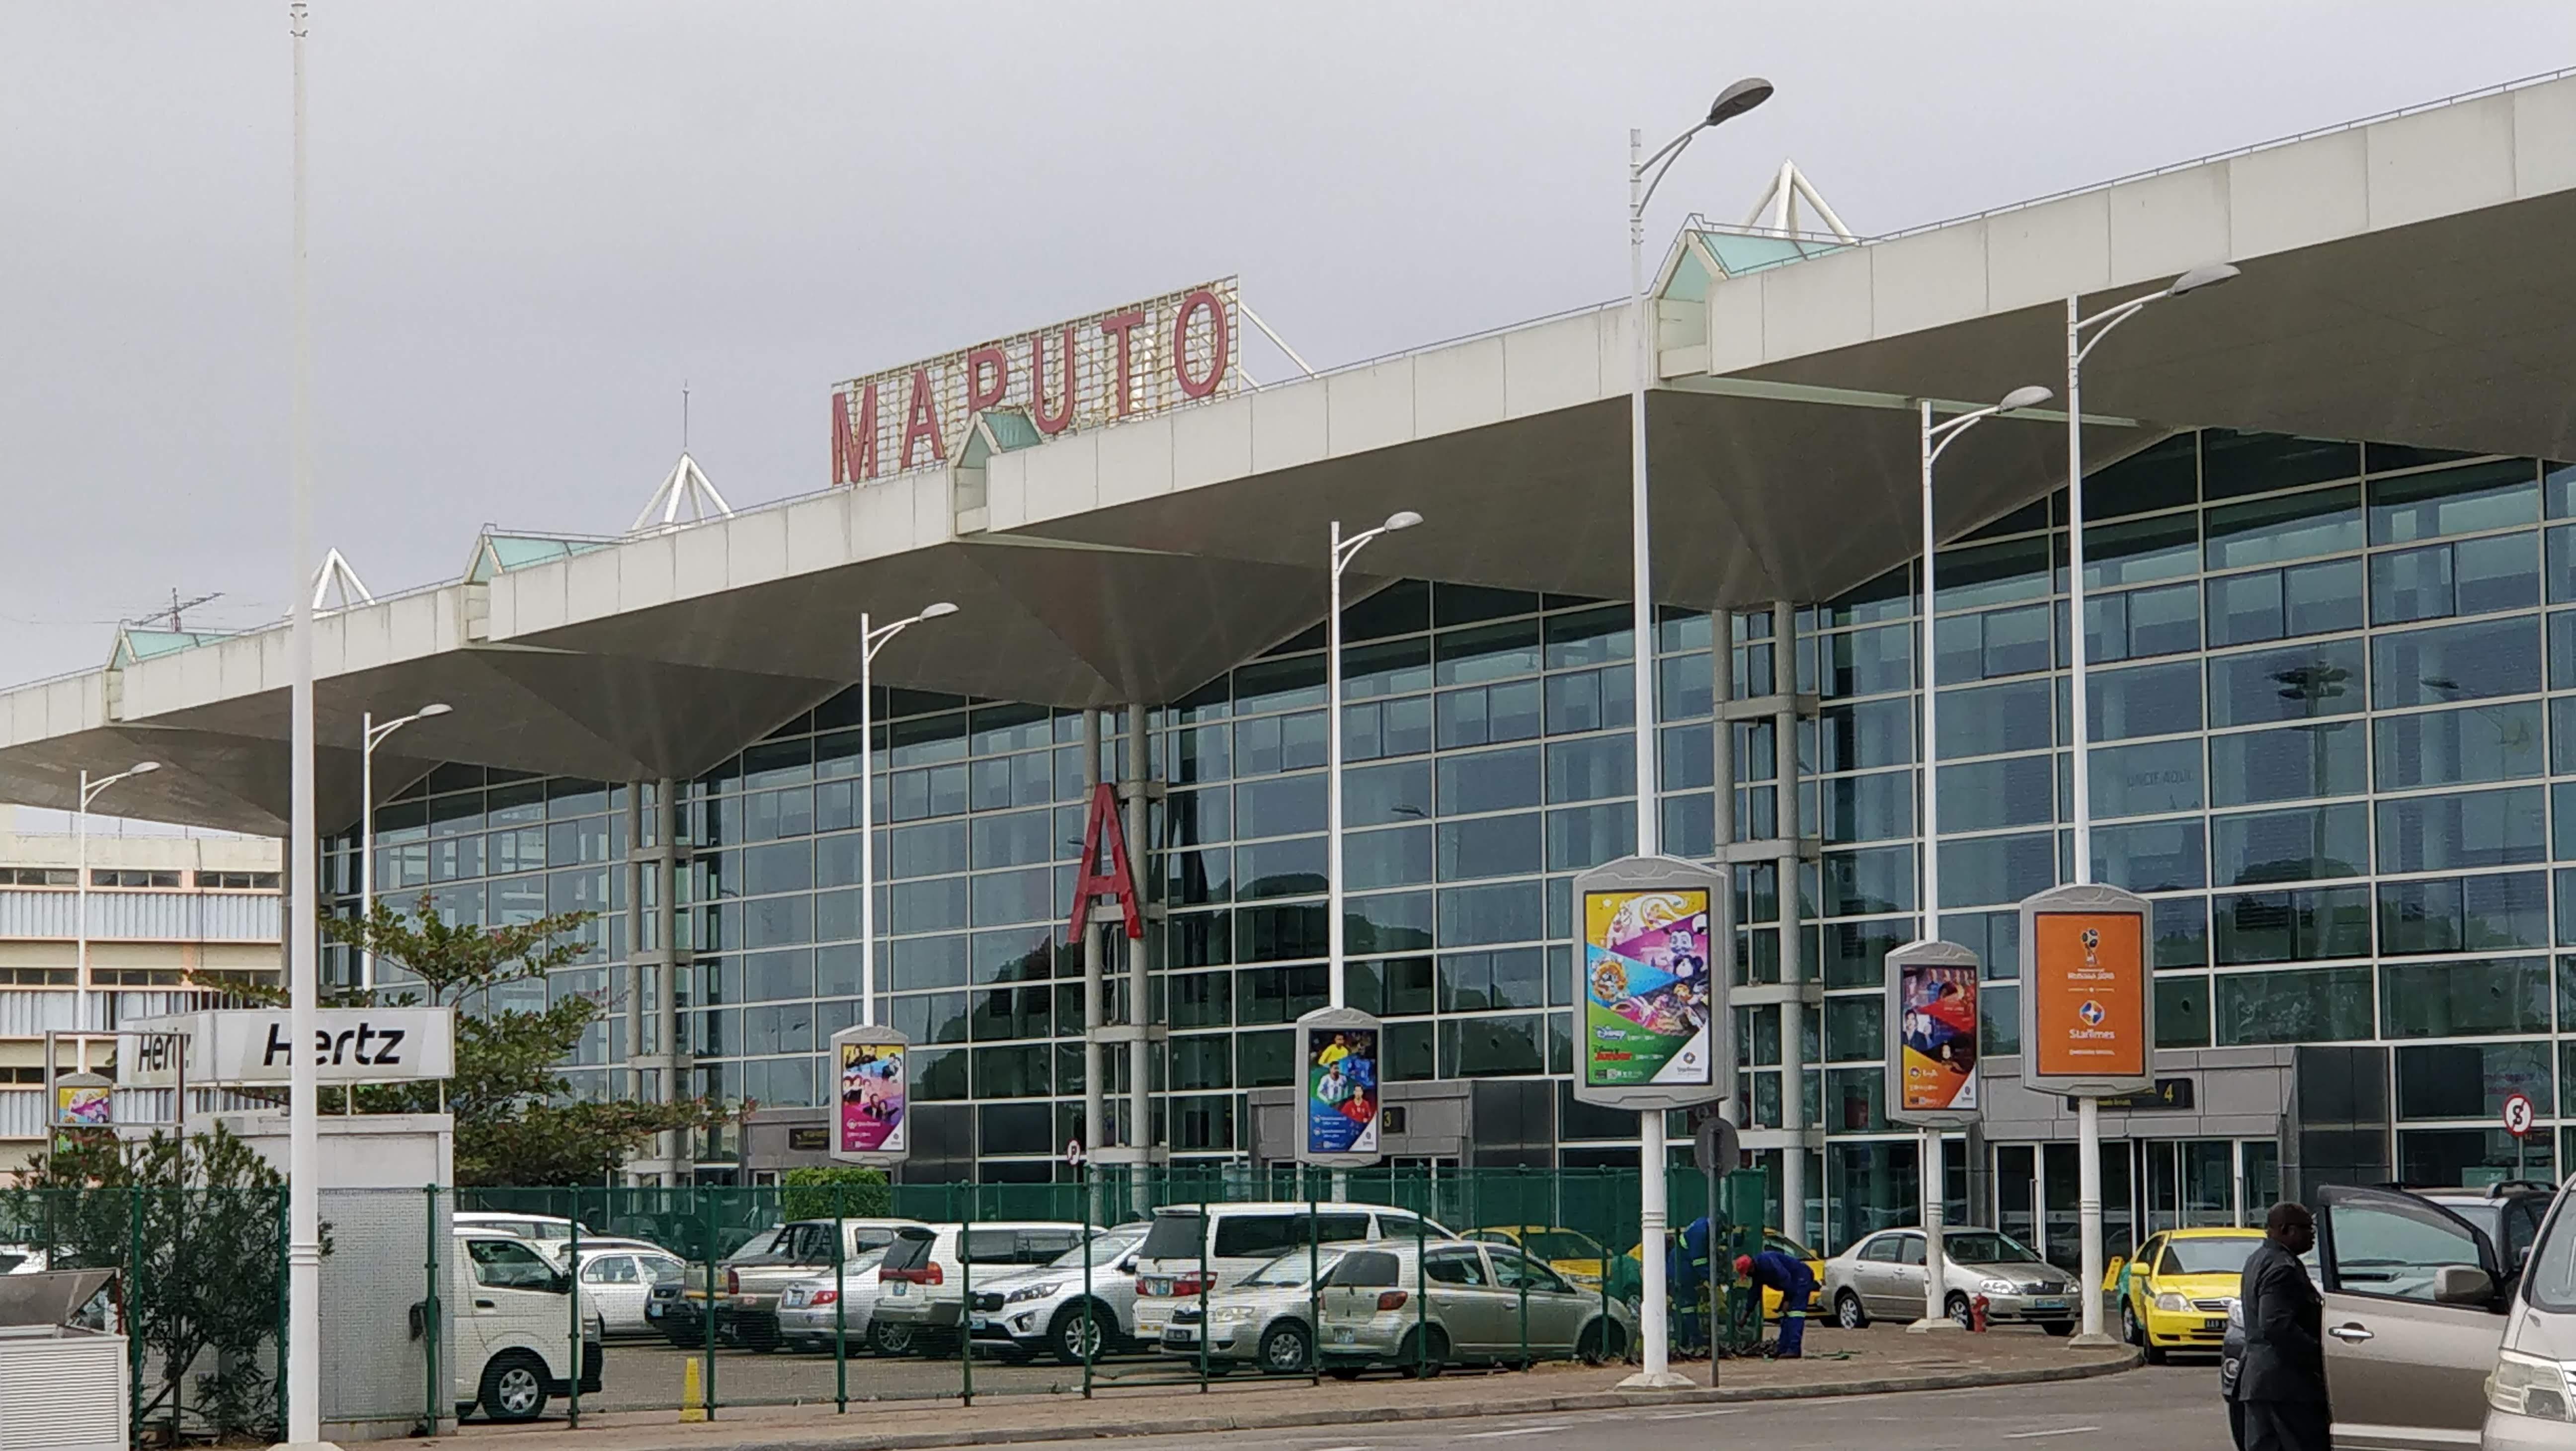 Maputo Maputo Turistica Di Viaggio Turistica Viaggio WikivoyageGuida WikivoyageGuida Di Maputo WikivoyageGuida pSUzMV